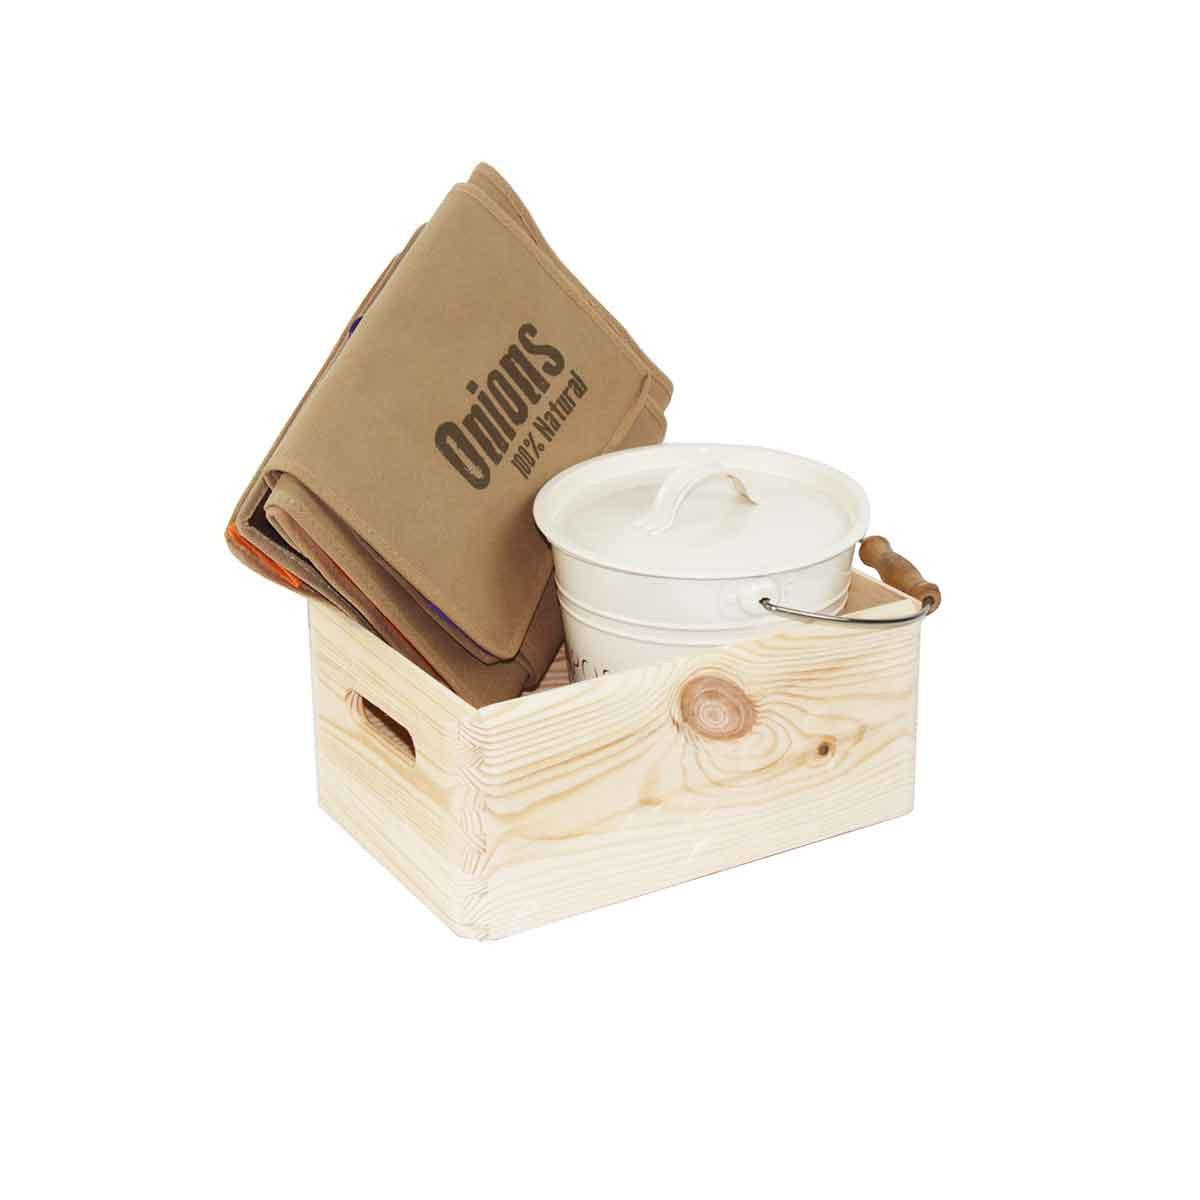 kit cadeau cuisine original. Black Bedroom Furniture Sets. Home Design Ideas